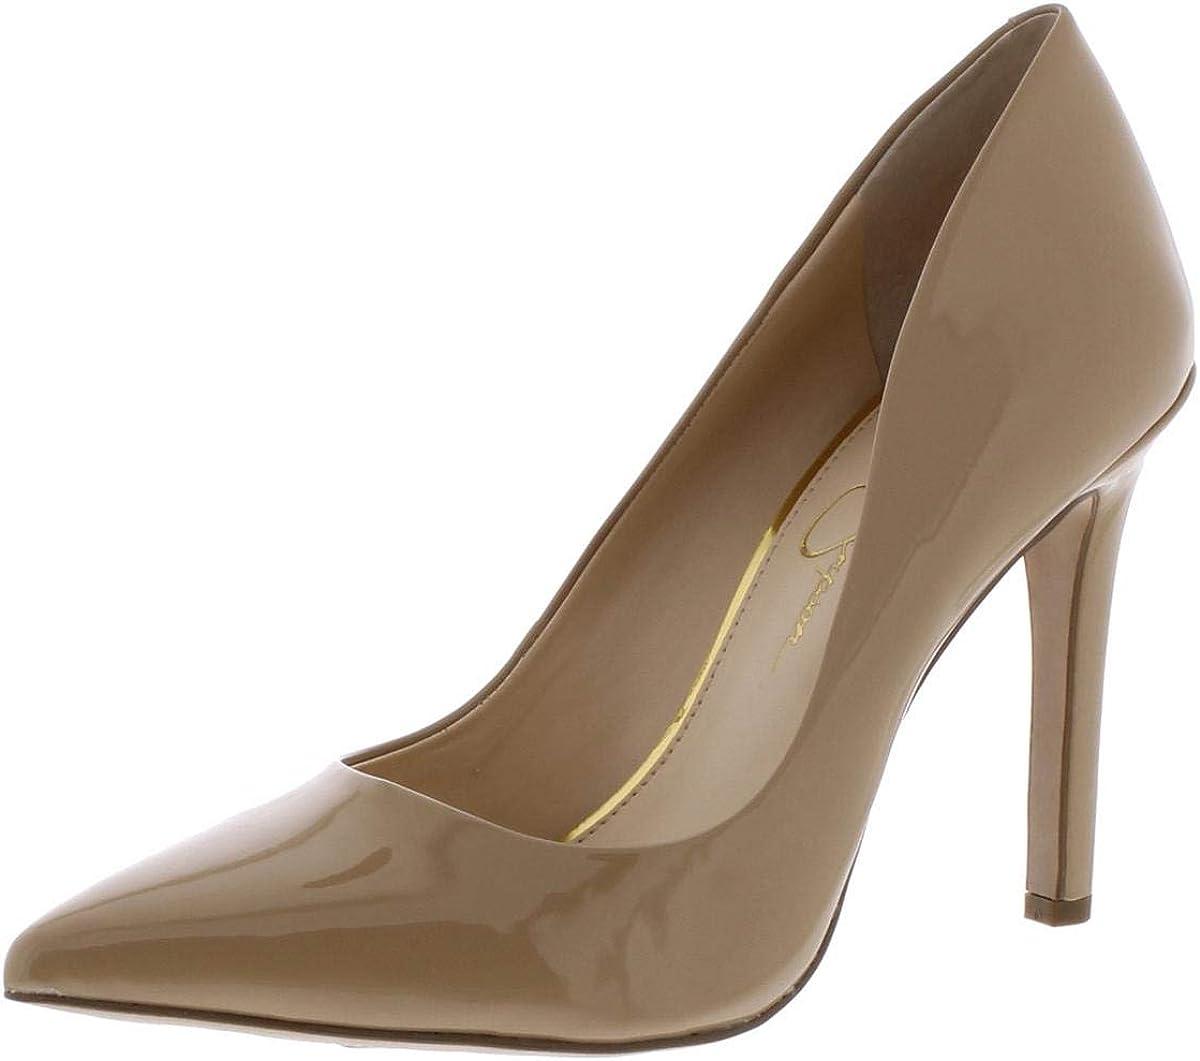 Limited price Jessica Simpson Womens Dress Cassani Pumps Indefinitely